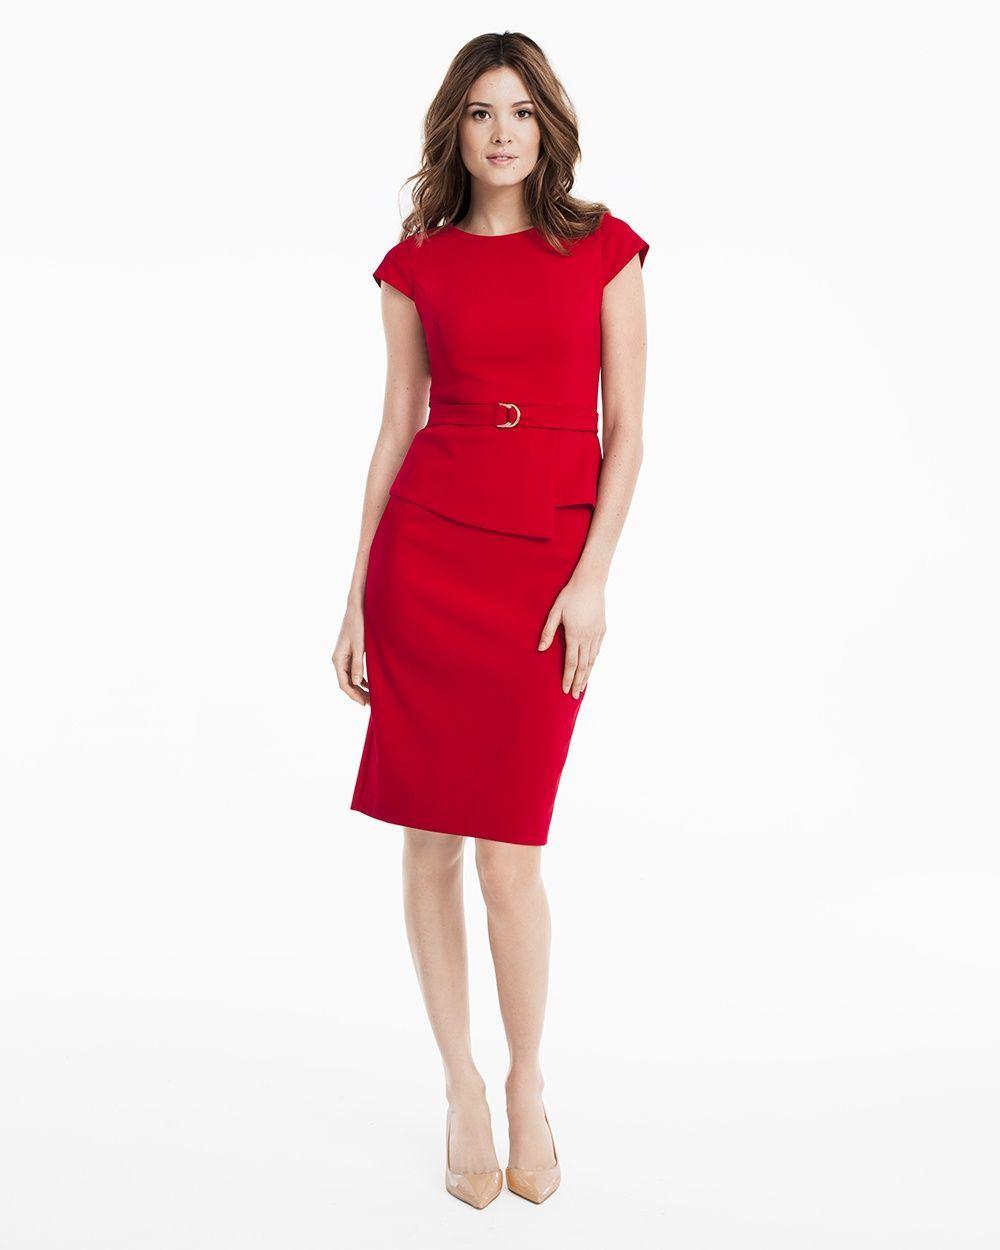 Womenus cap sleeve peplum sheath dress by whbm cap and products